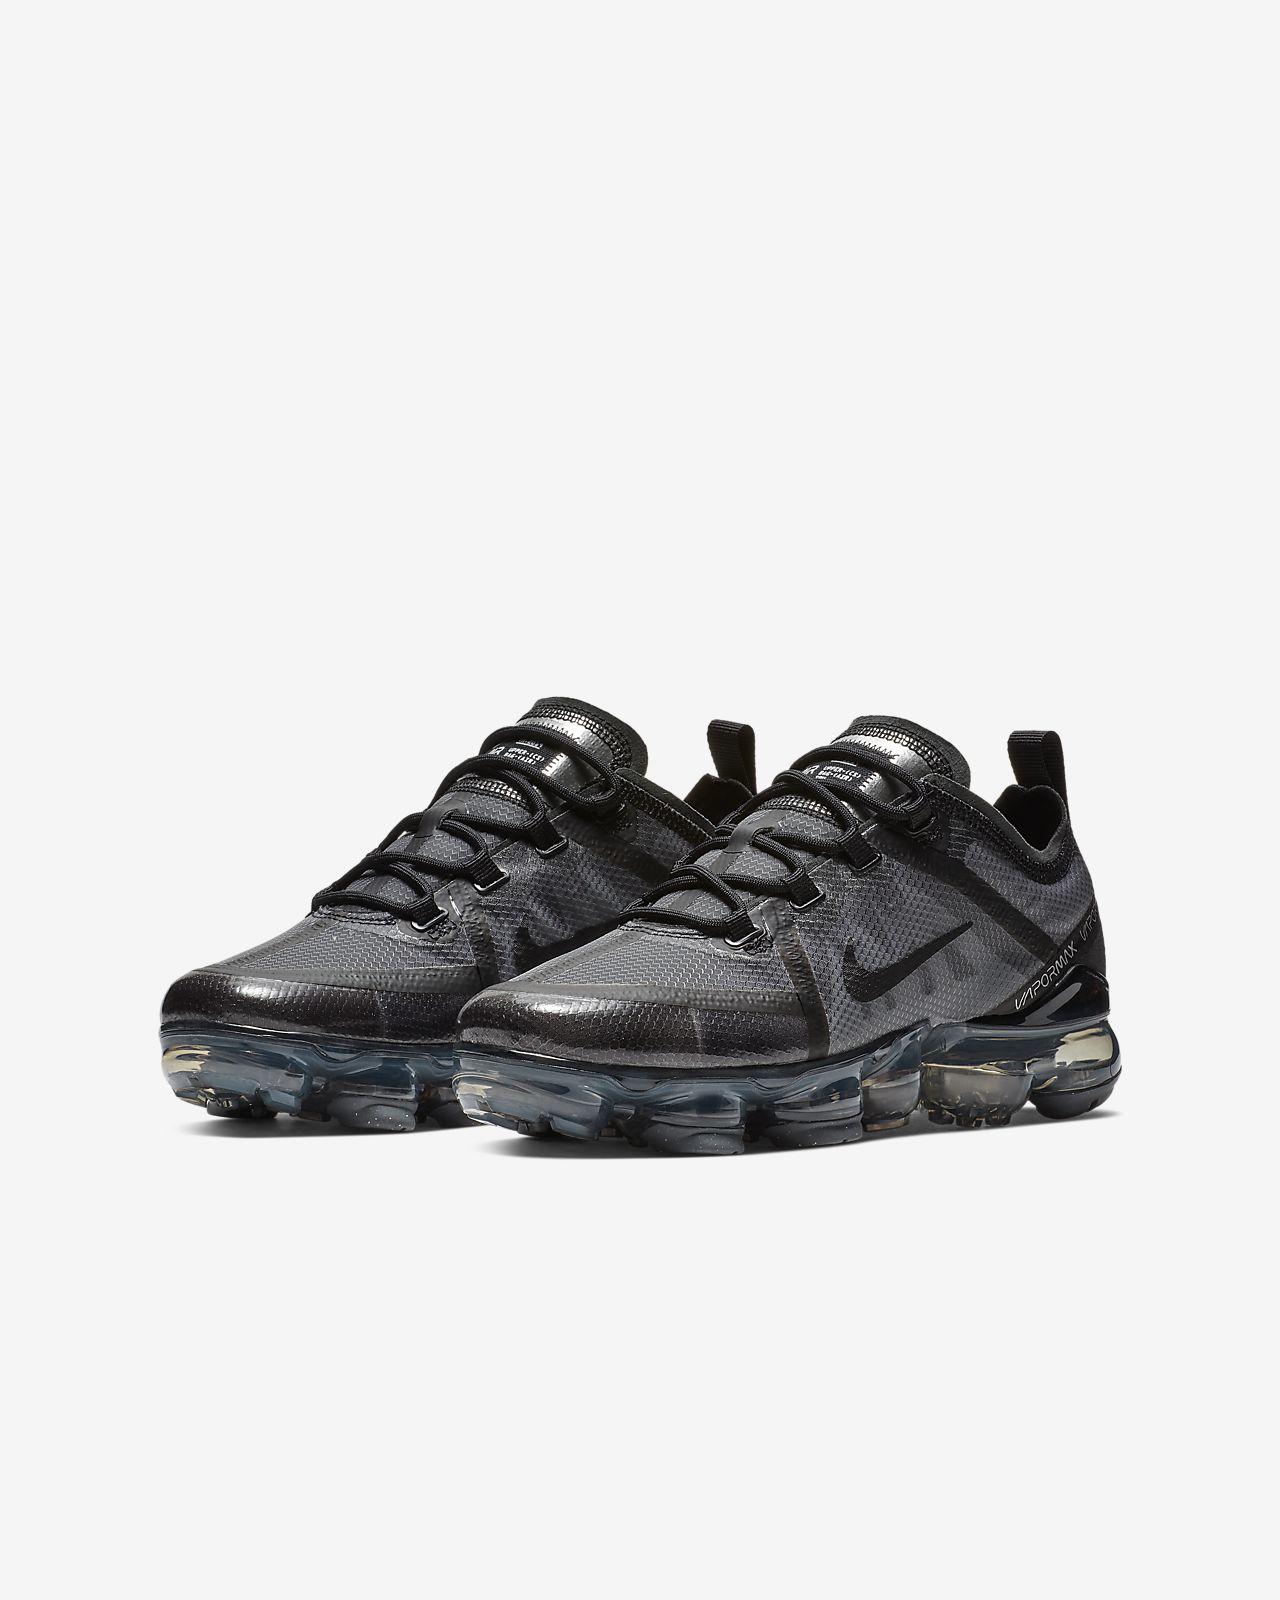 fedb8d1ce4d Nike Air VaporMax 2019 Older Kids  Shoe. Nike.com PT